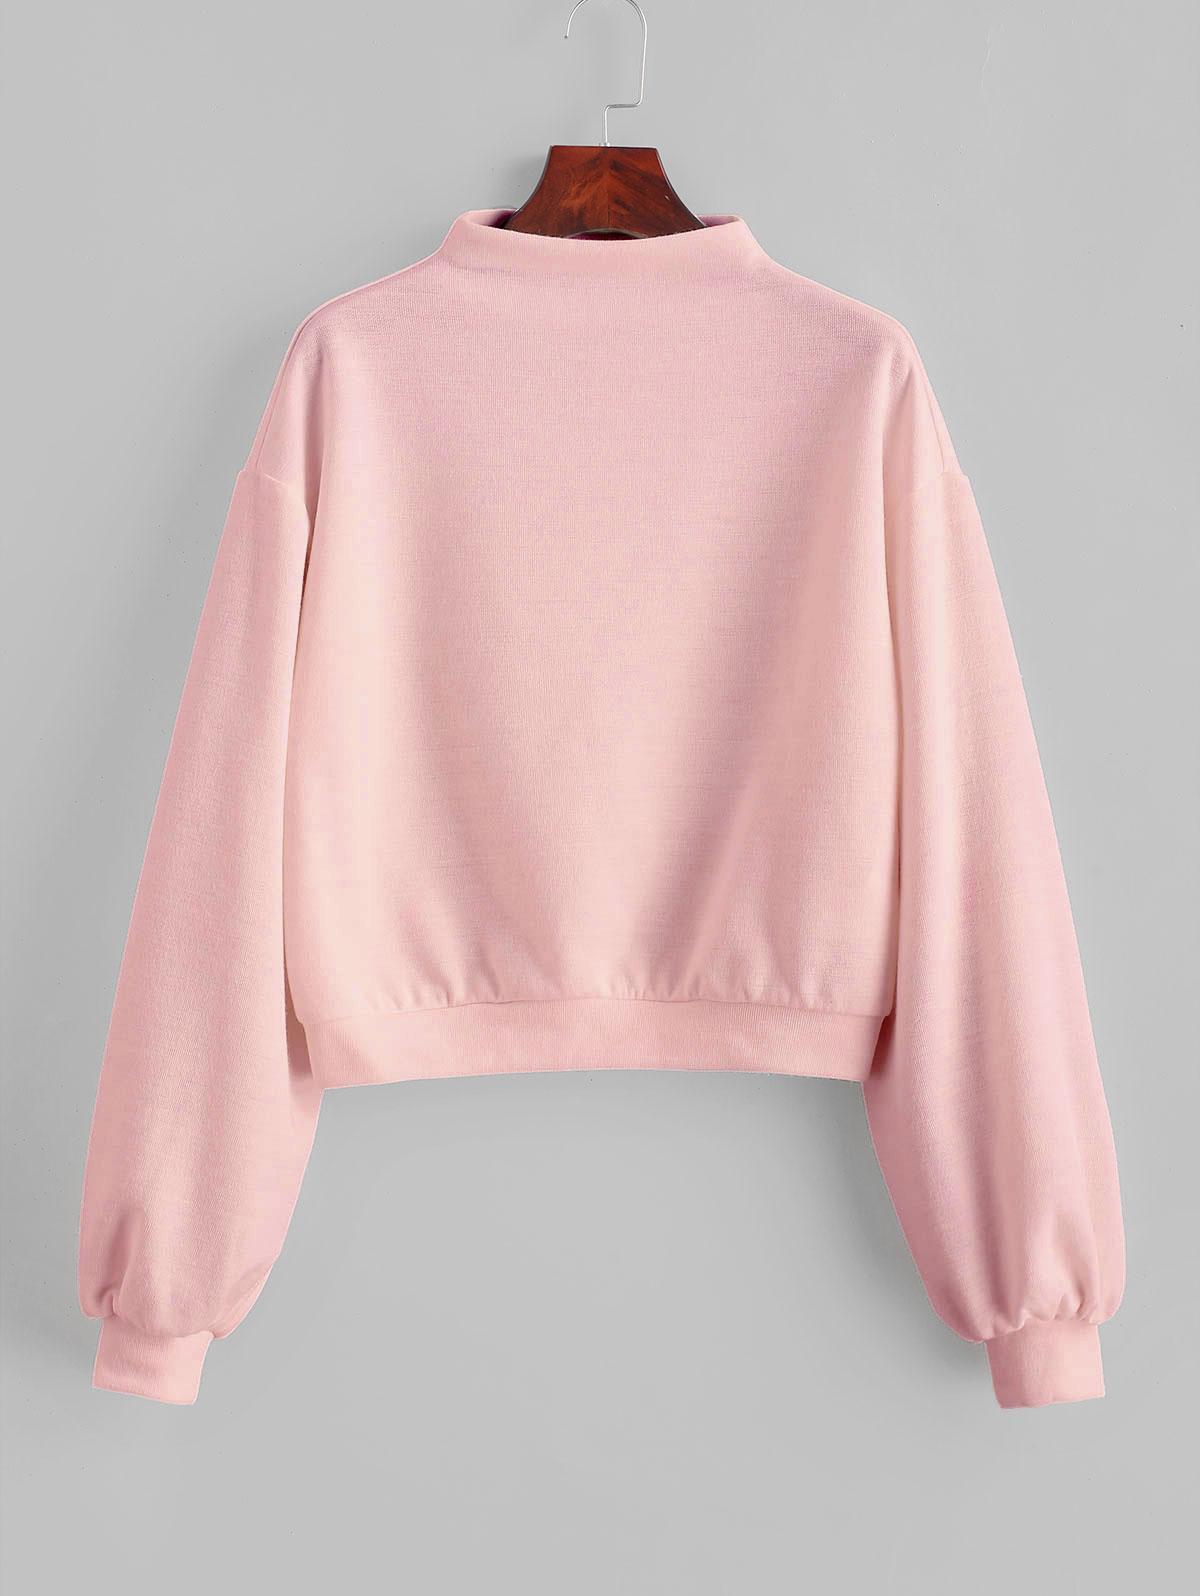 ZAFUL Pullover Mock Neck Plain Sweatshirt thumbnail